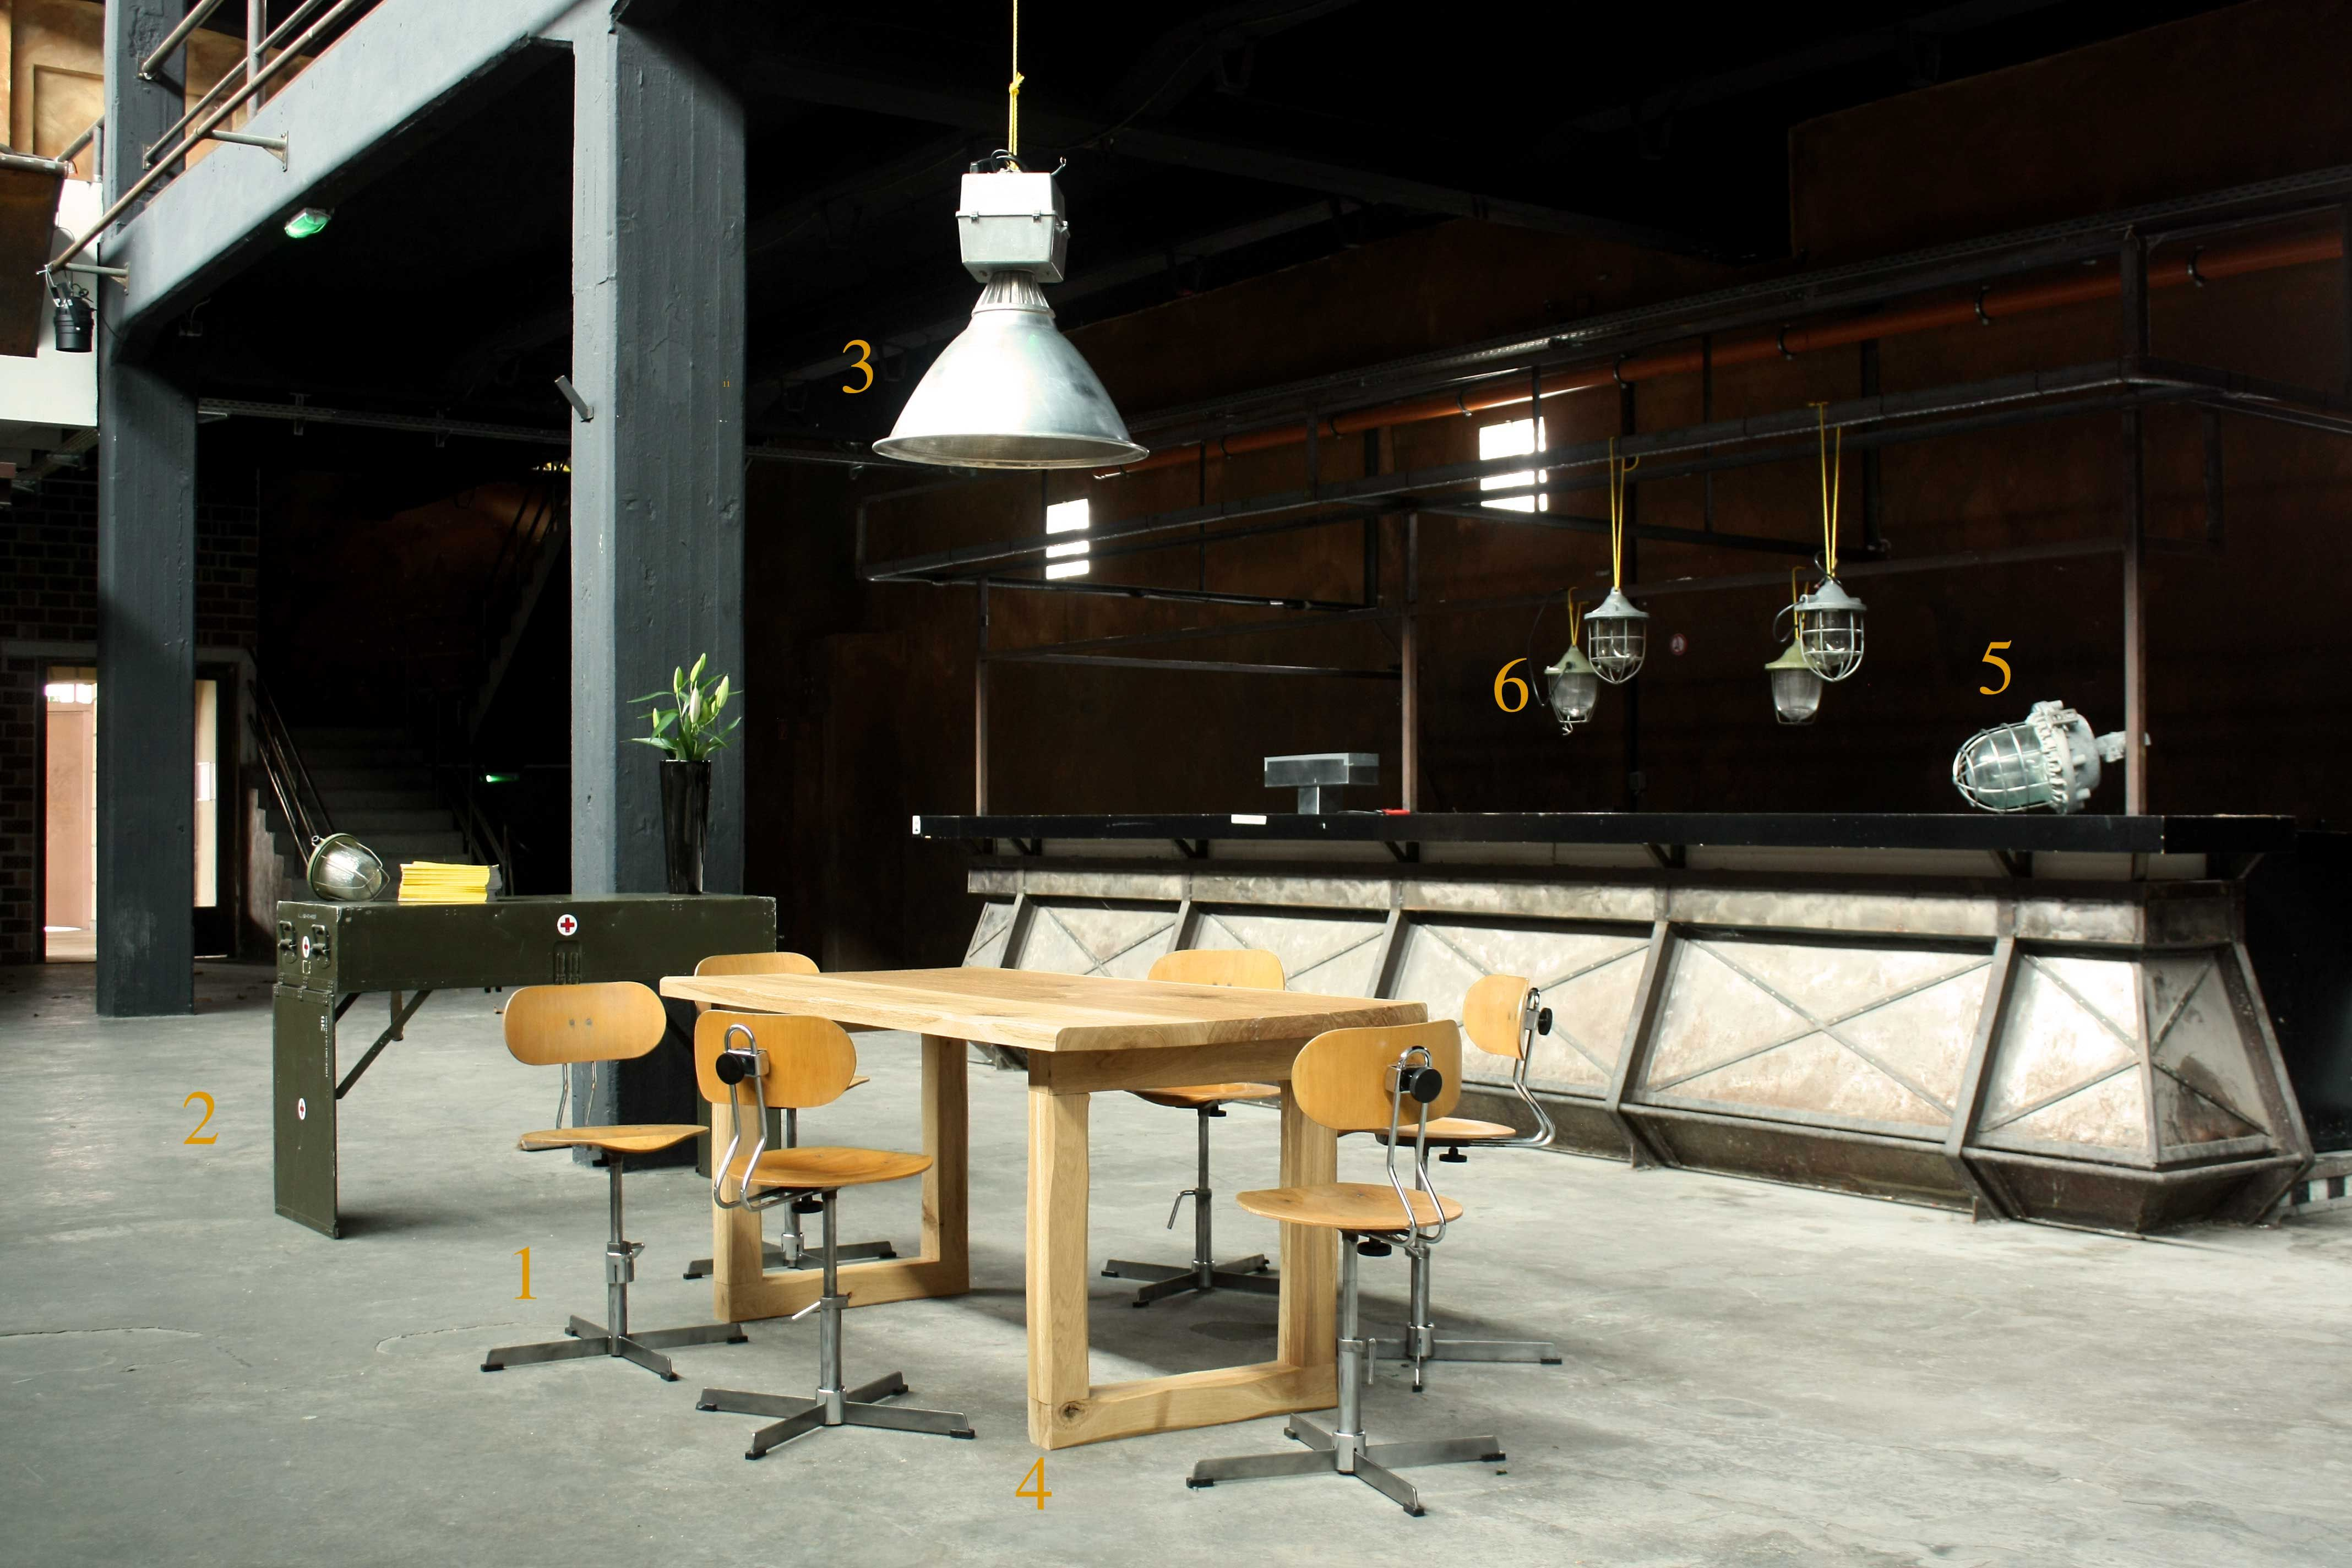 Industriemöbel vintage industriemöbel vintage industrie möbel vintage